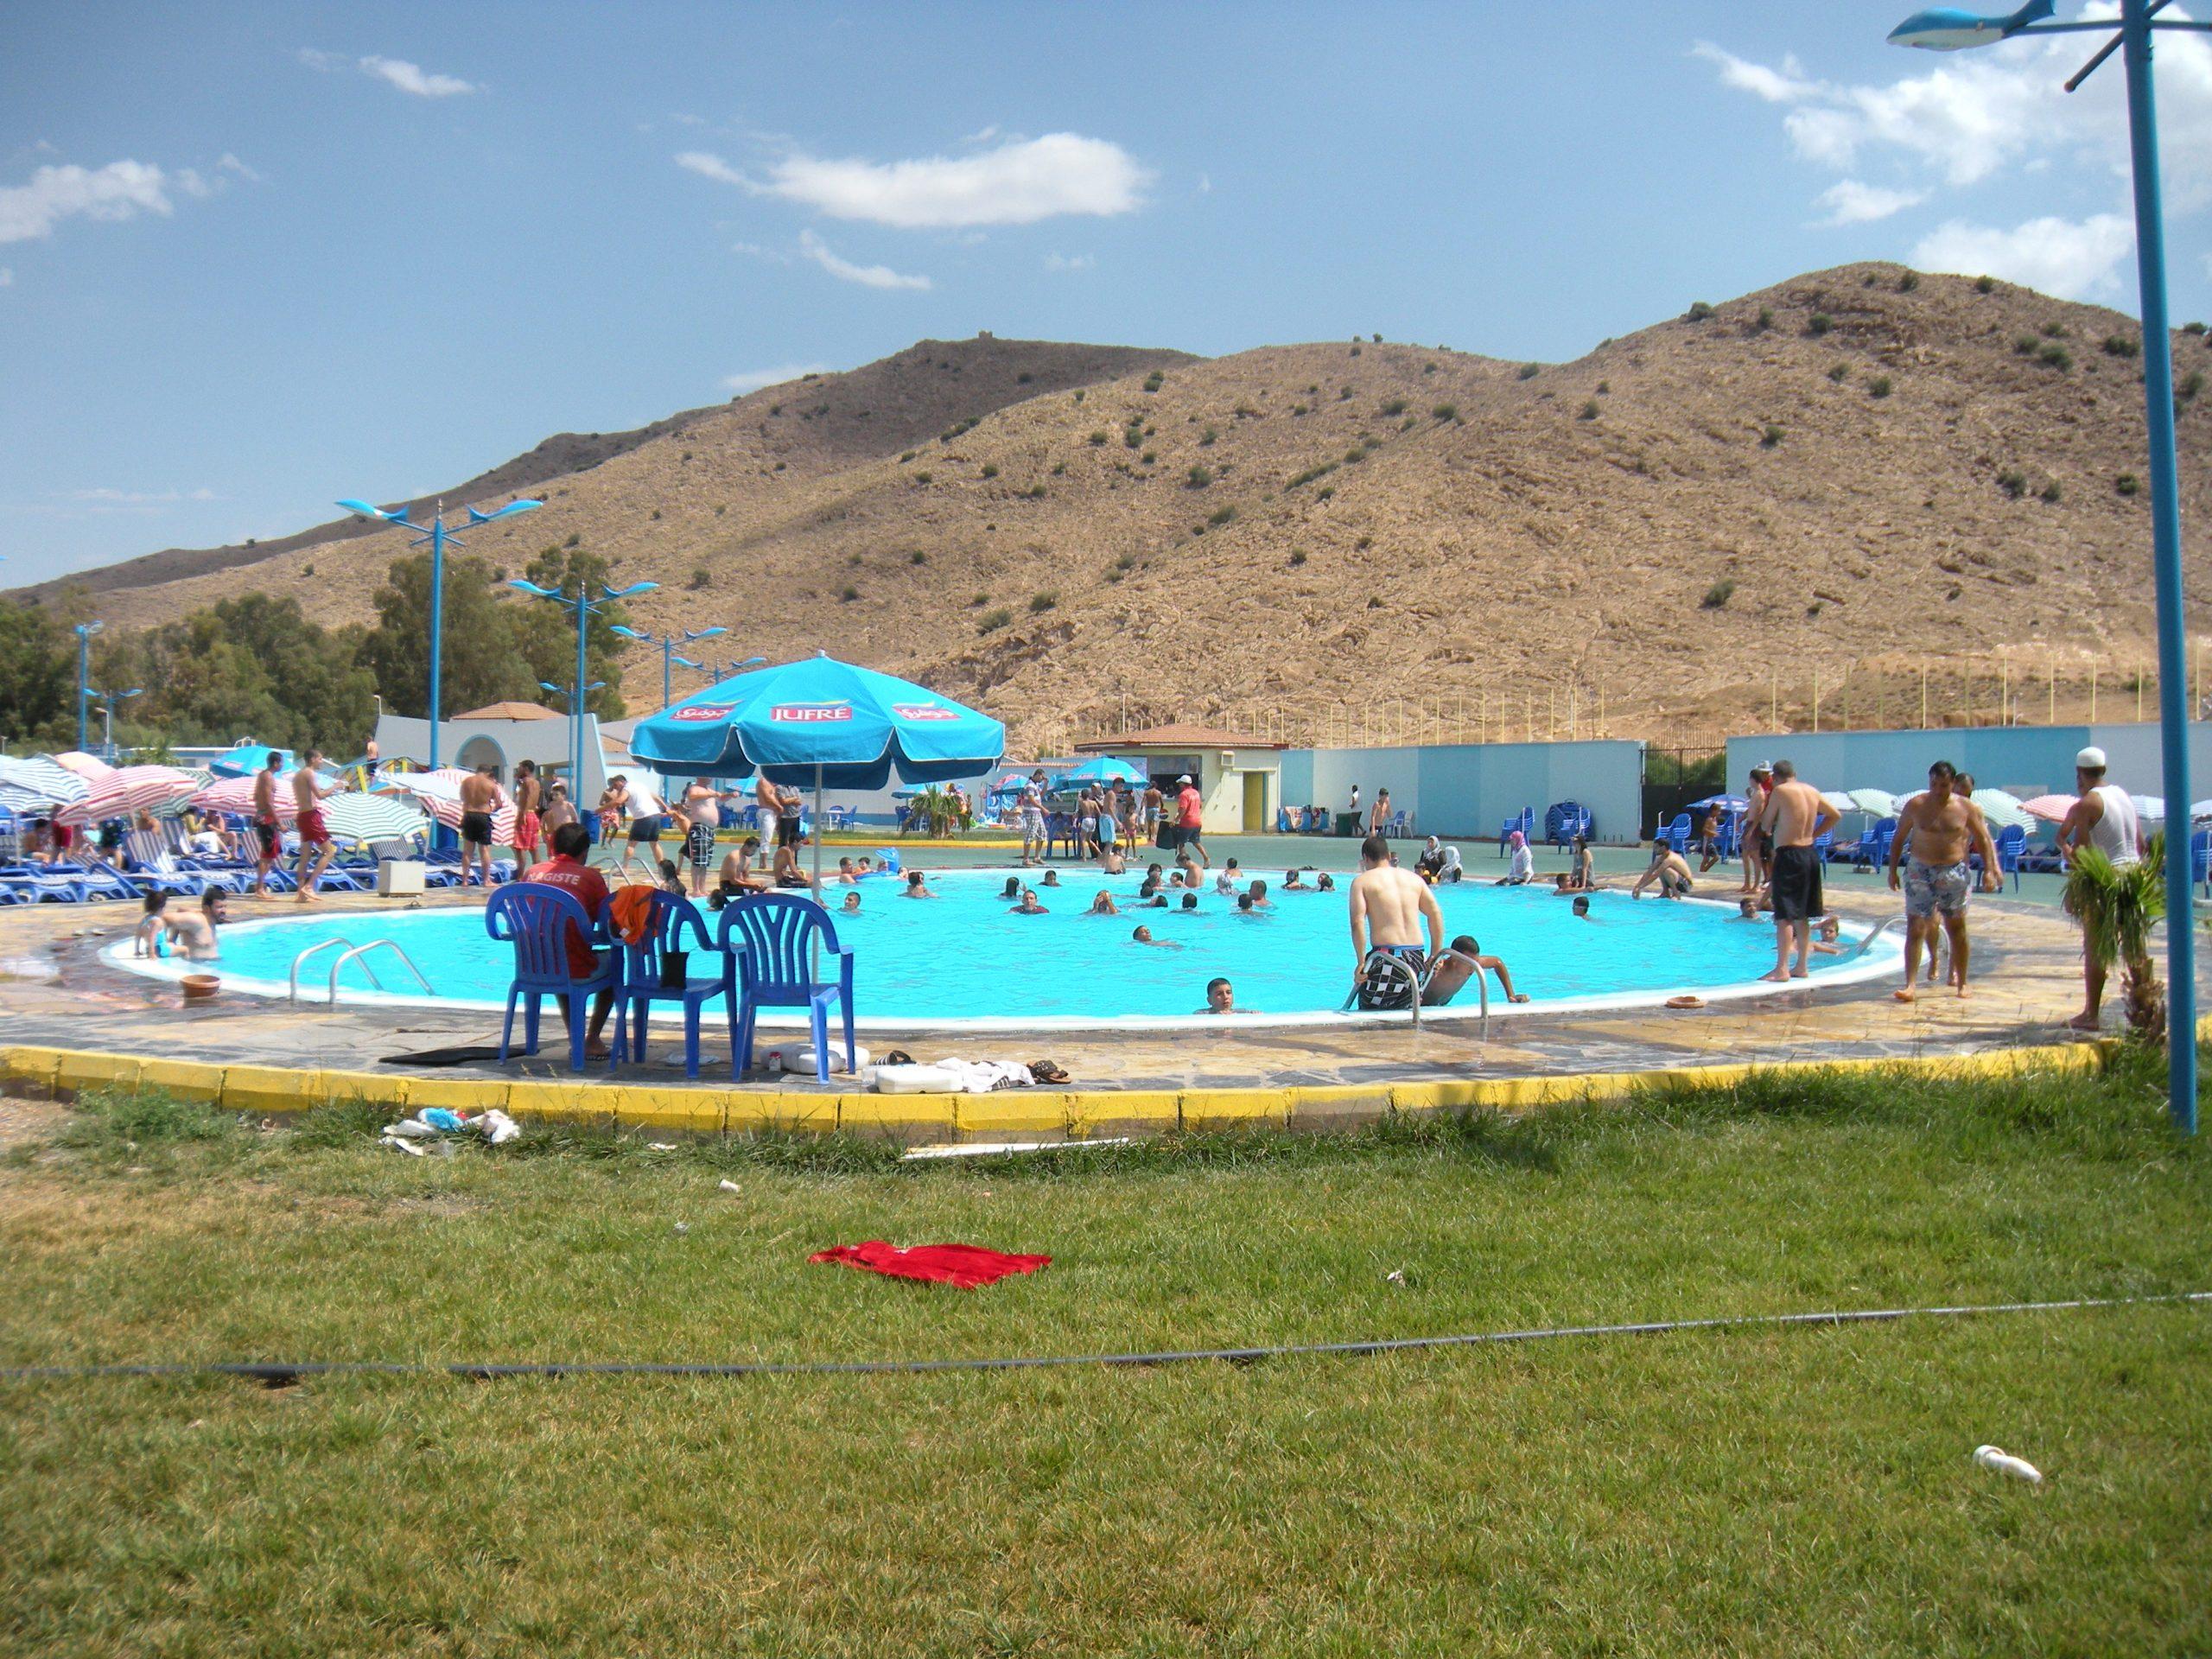 File:piscine 2 Aqualand Lompi Park.jpg - Wikimedia Commons pour Piscine Originale